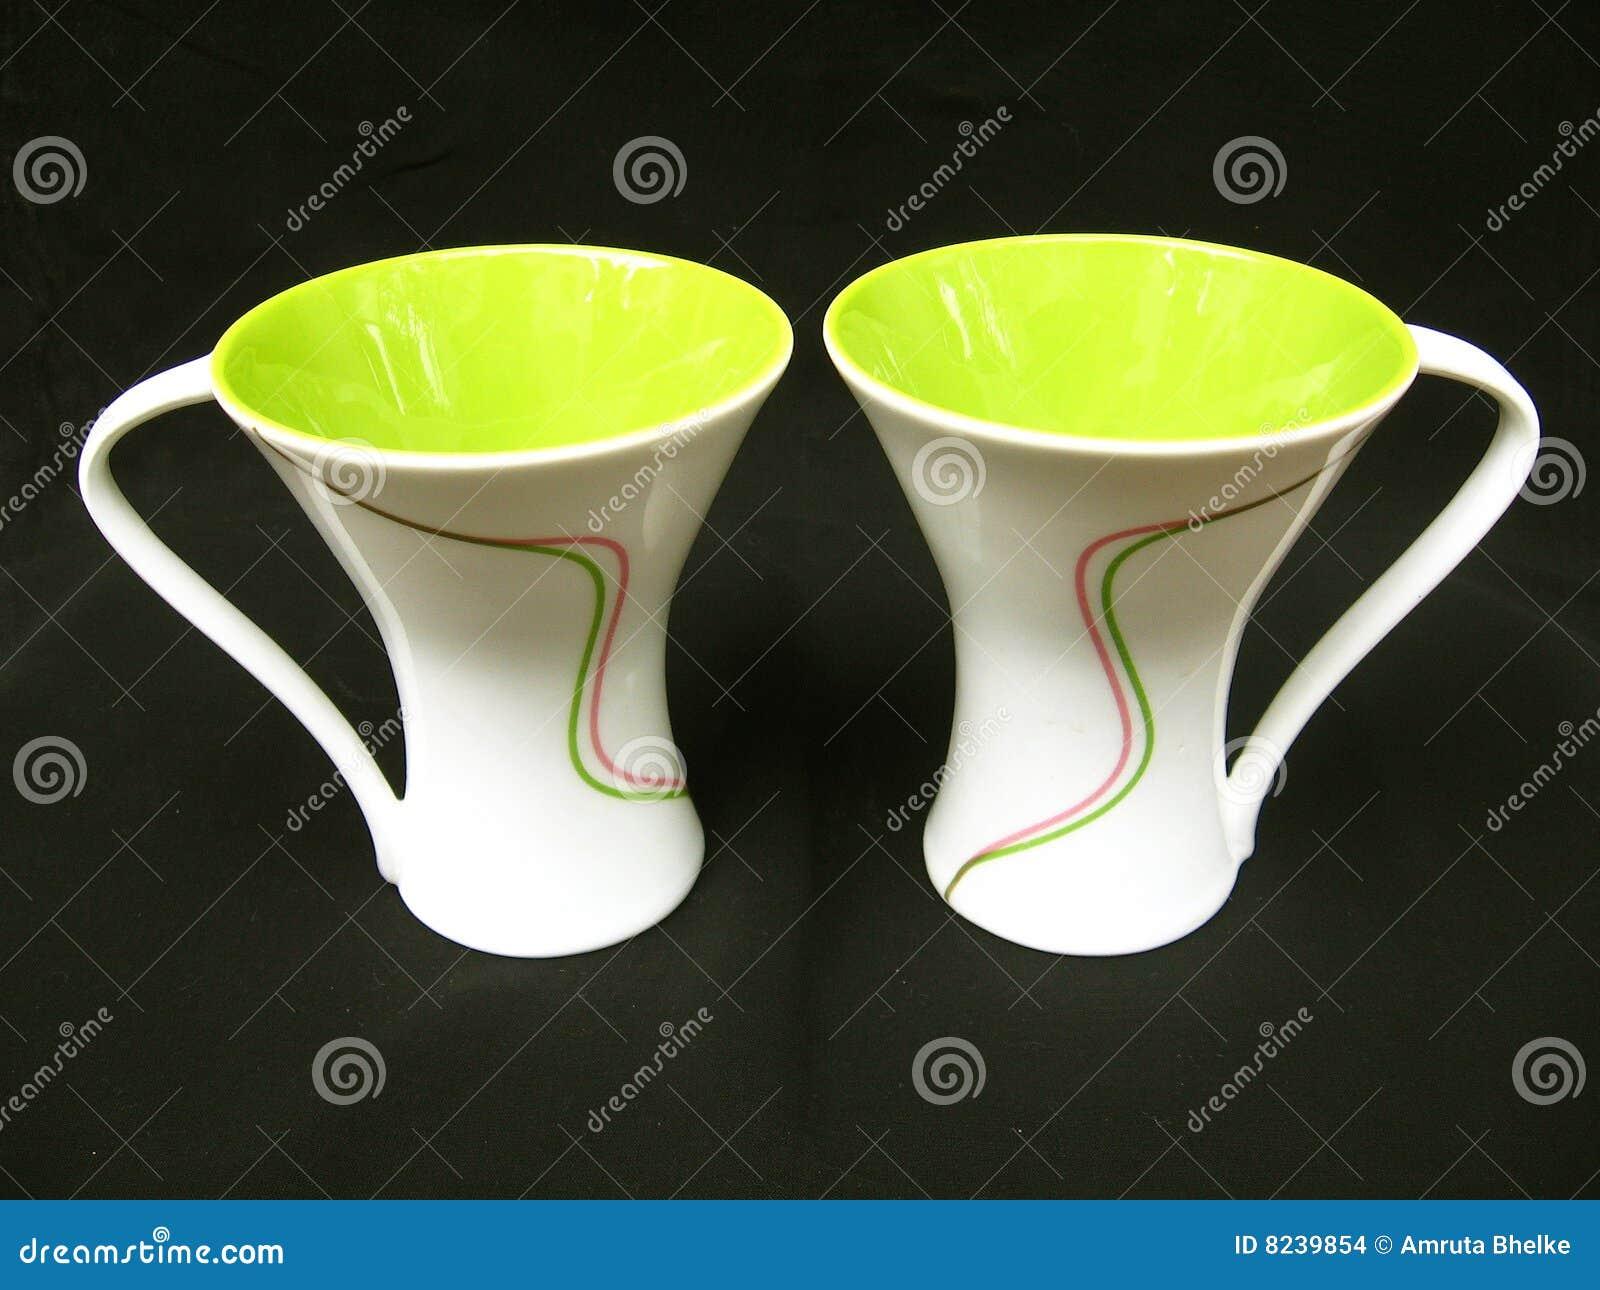 designer coffee mugs stock images  image  - coffee colored designer green mugs